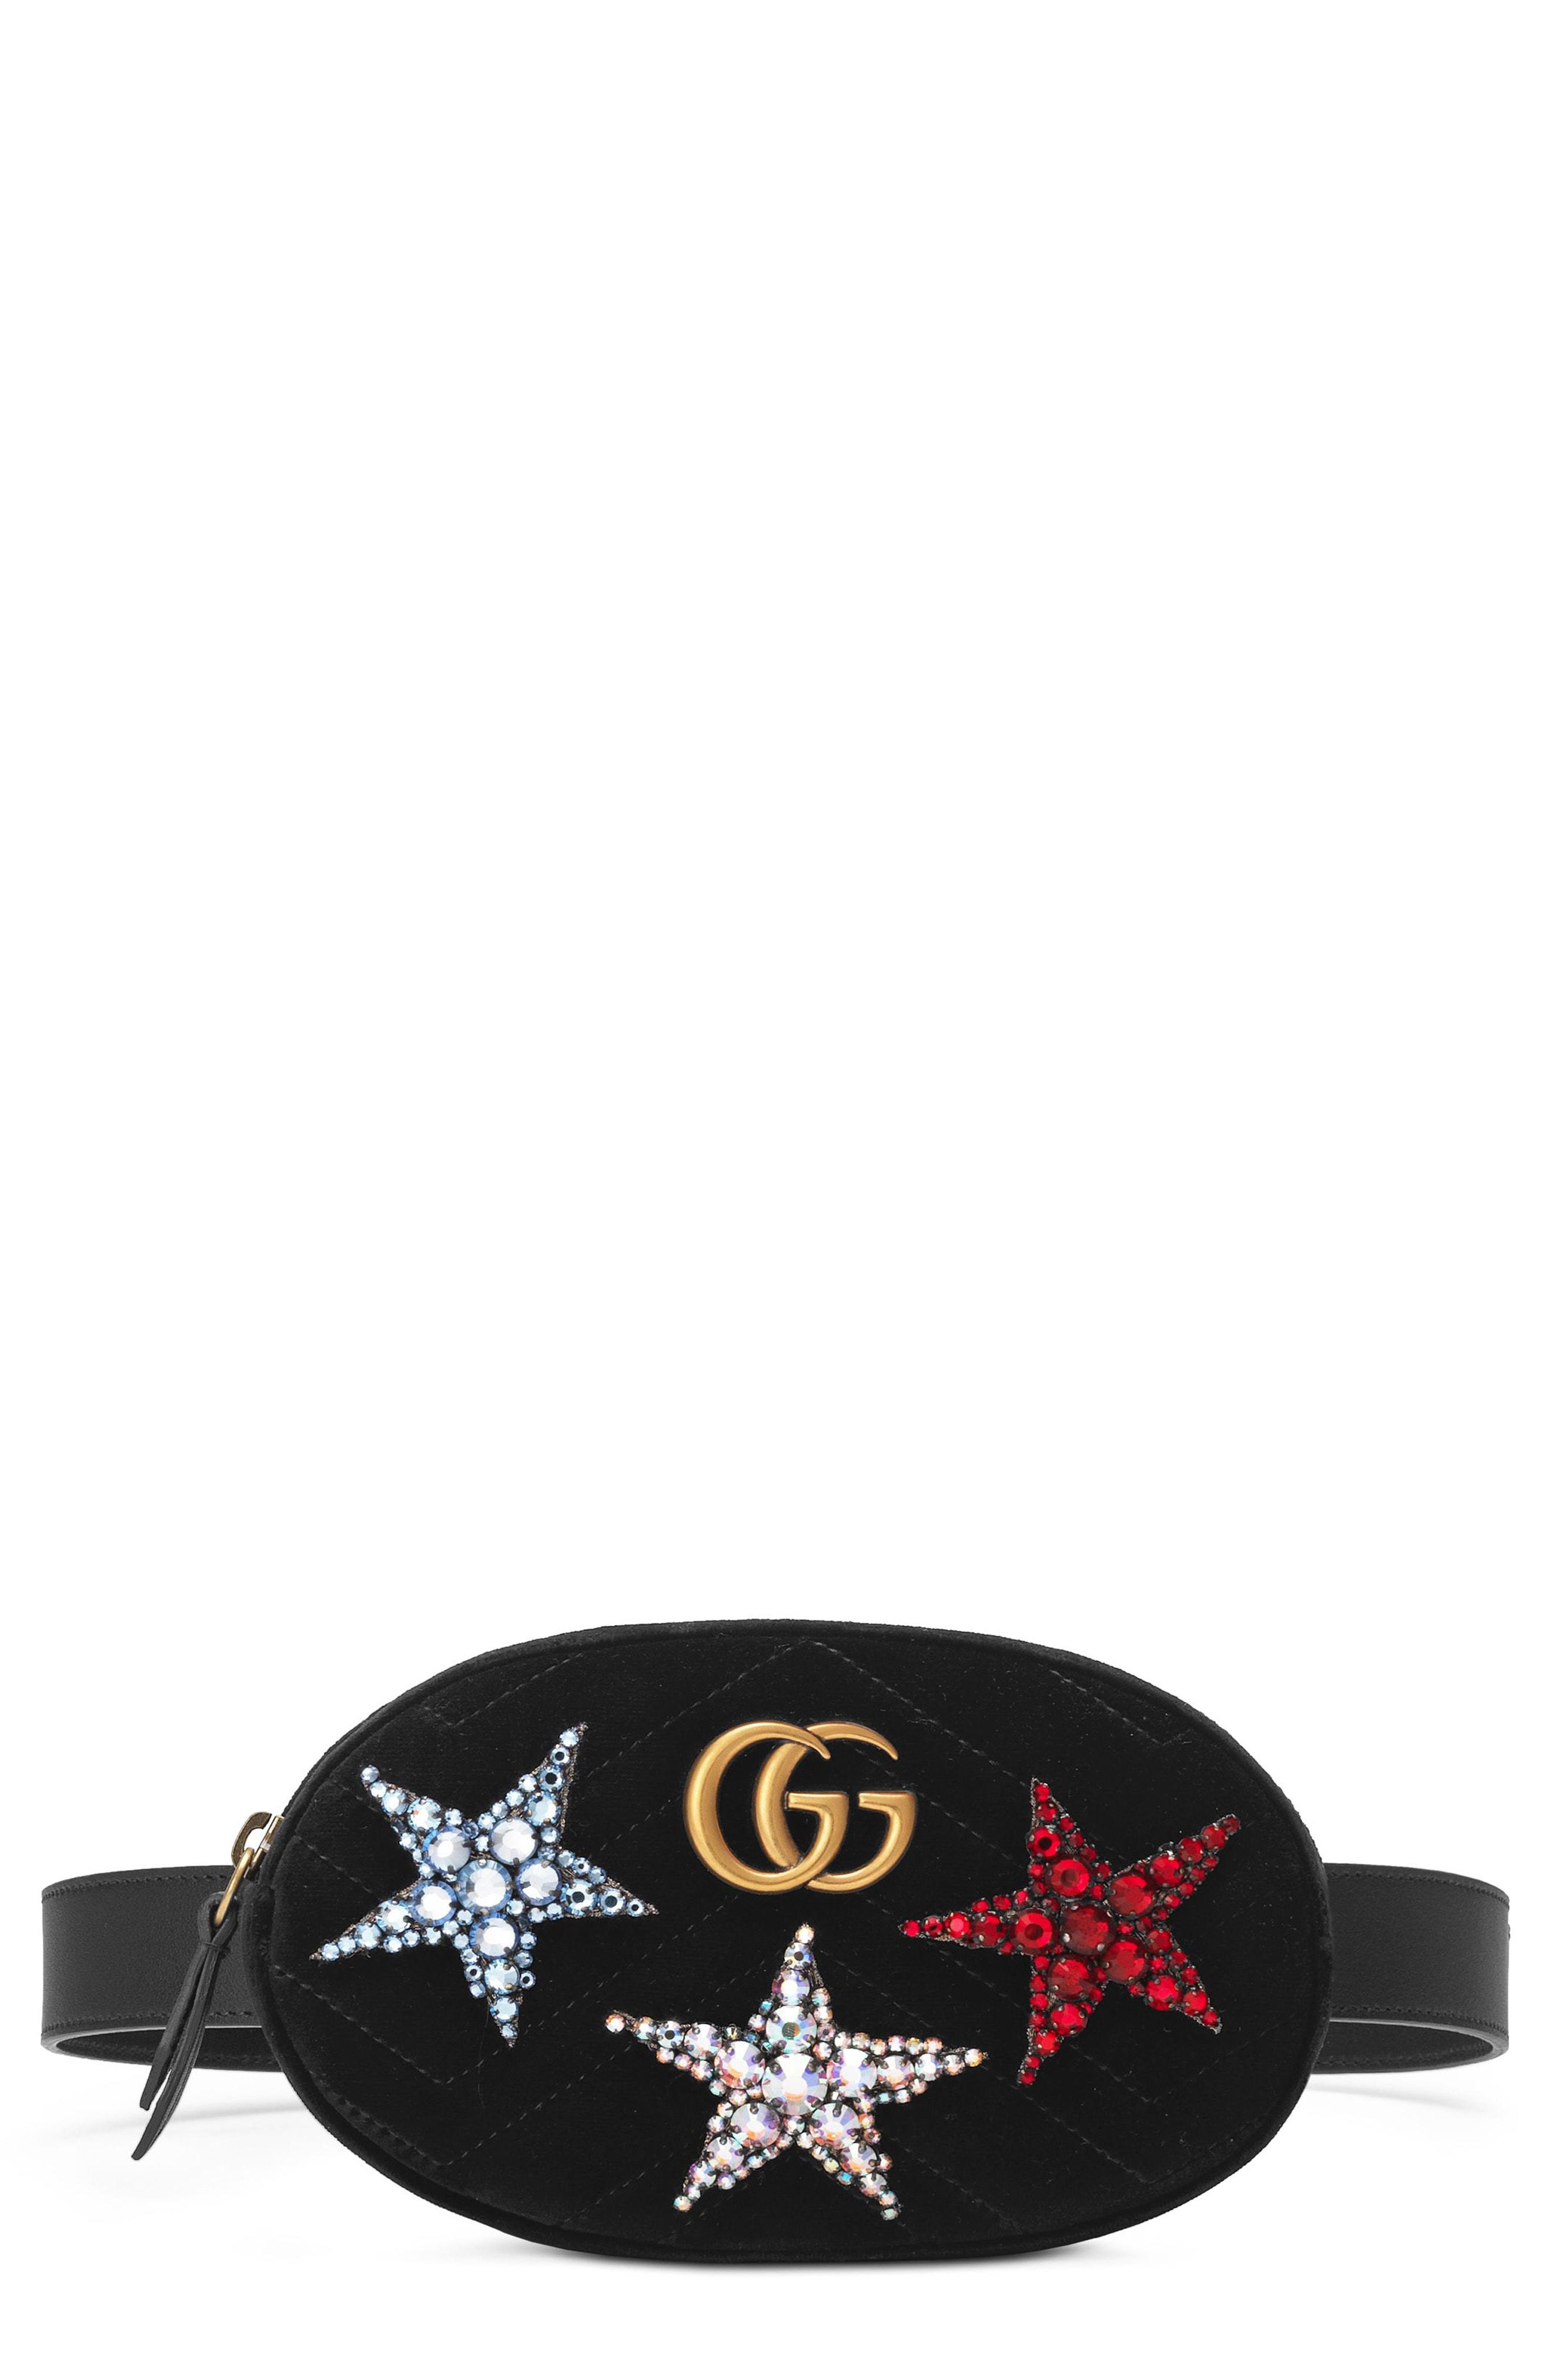 b18510cf351 Gucci Marmont 2.0 Crystal Stars Velvet Belt Bag - Black